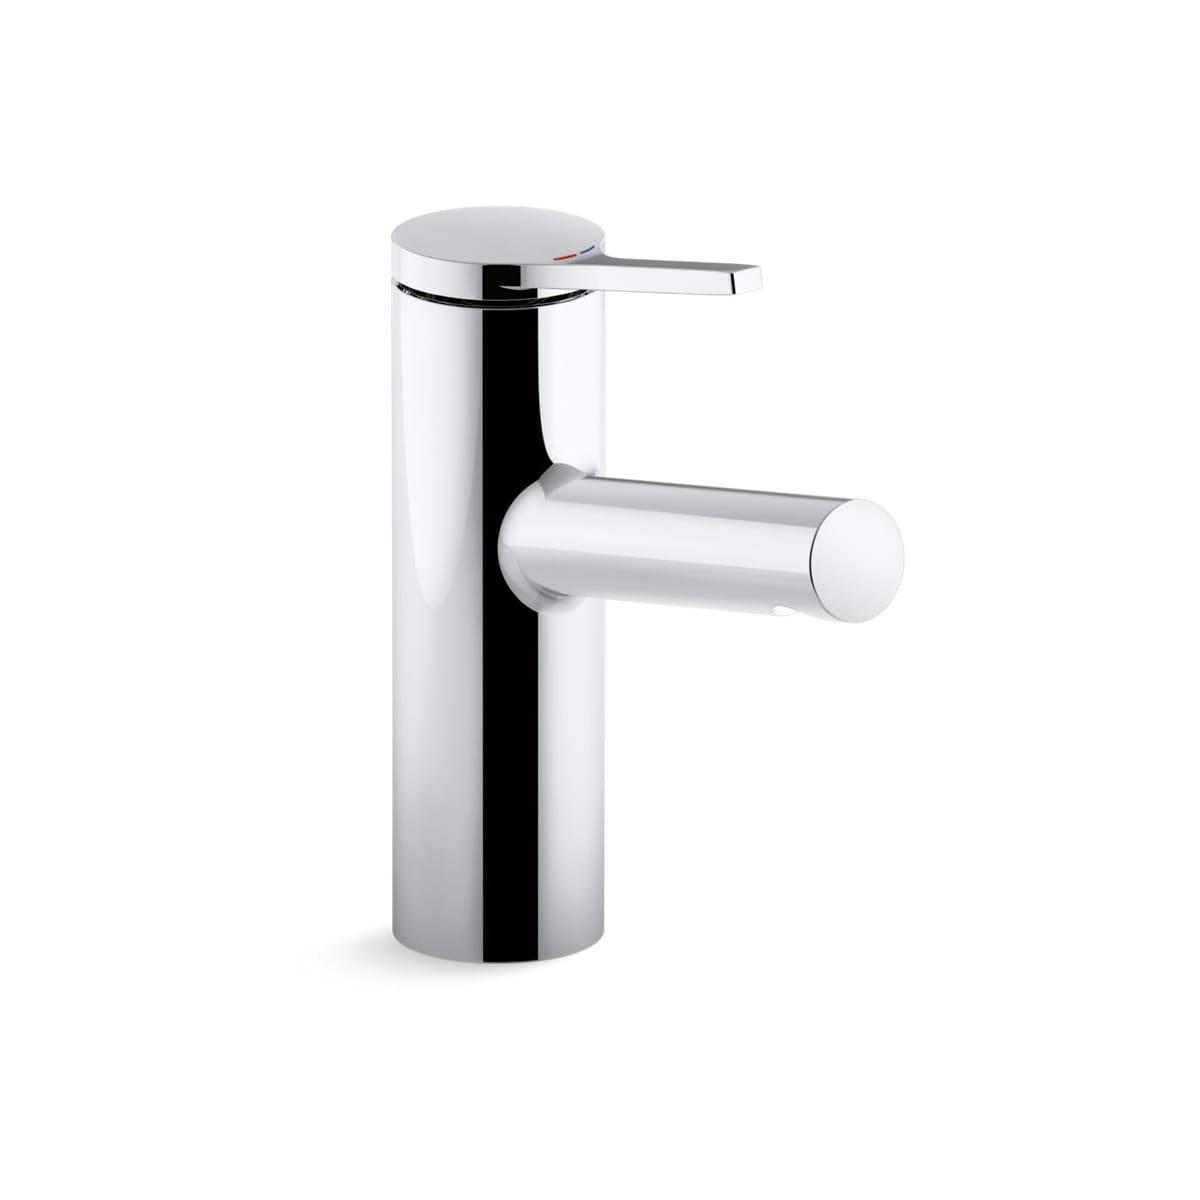 Bathroom Sinks - Undermount, Pedestal & More: Kohler ...